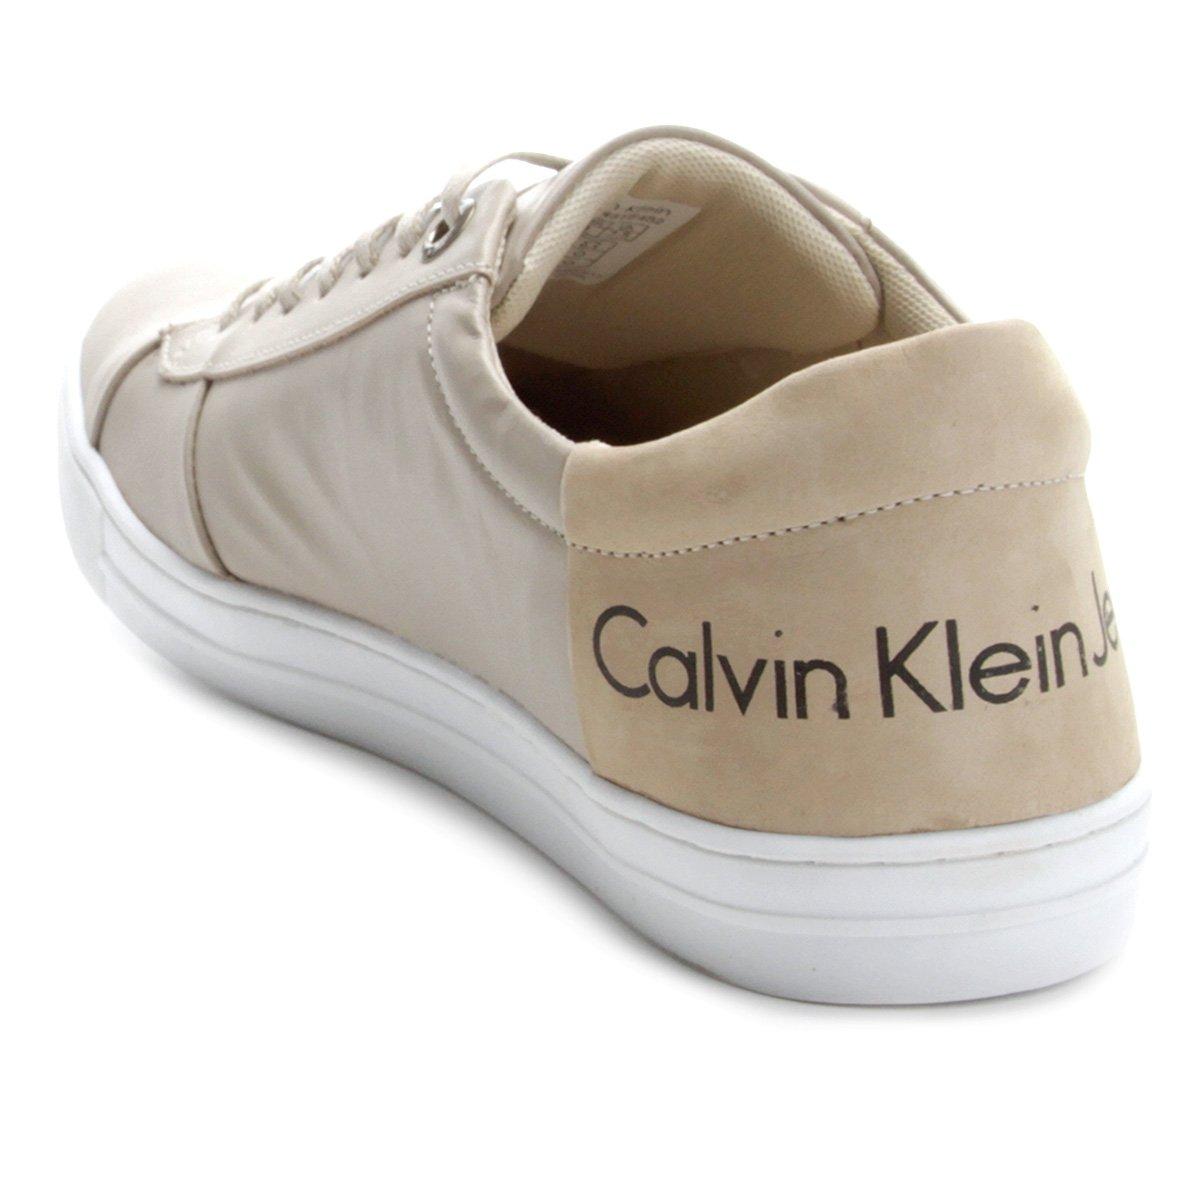 Masculino Bege Klein Calvin Sapatênis Couro Sapatênis Branco e Couro Twq8Zg8X